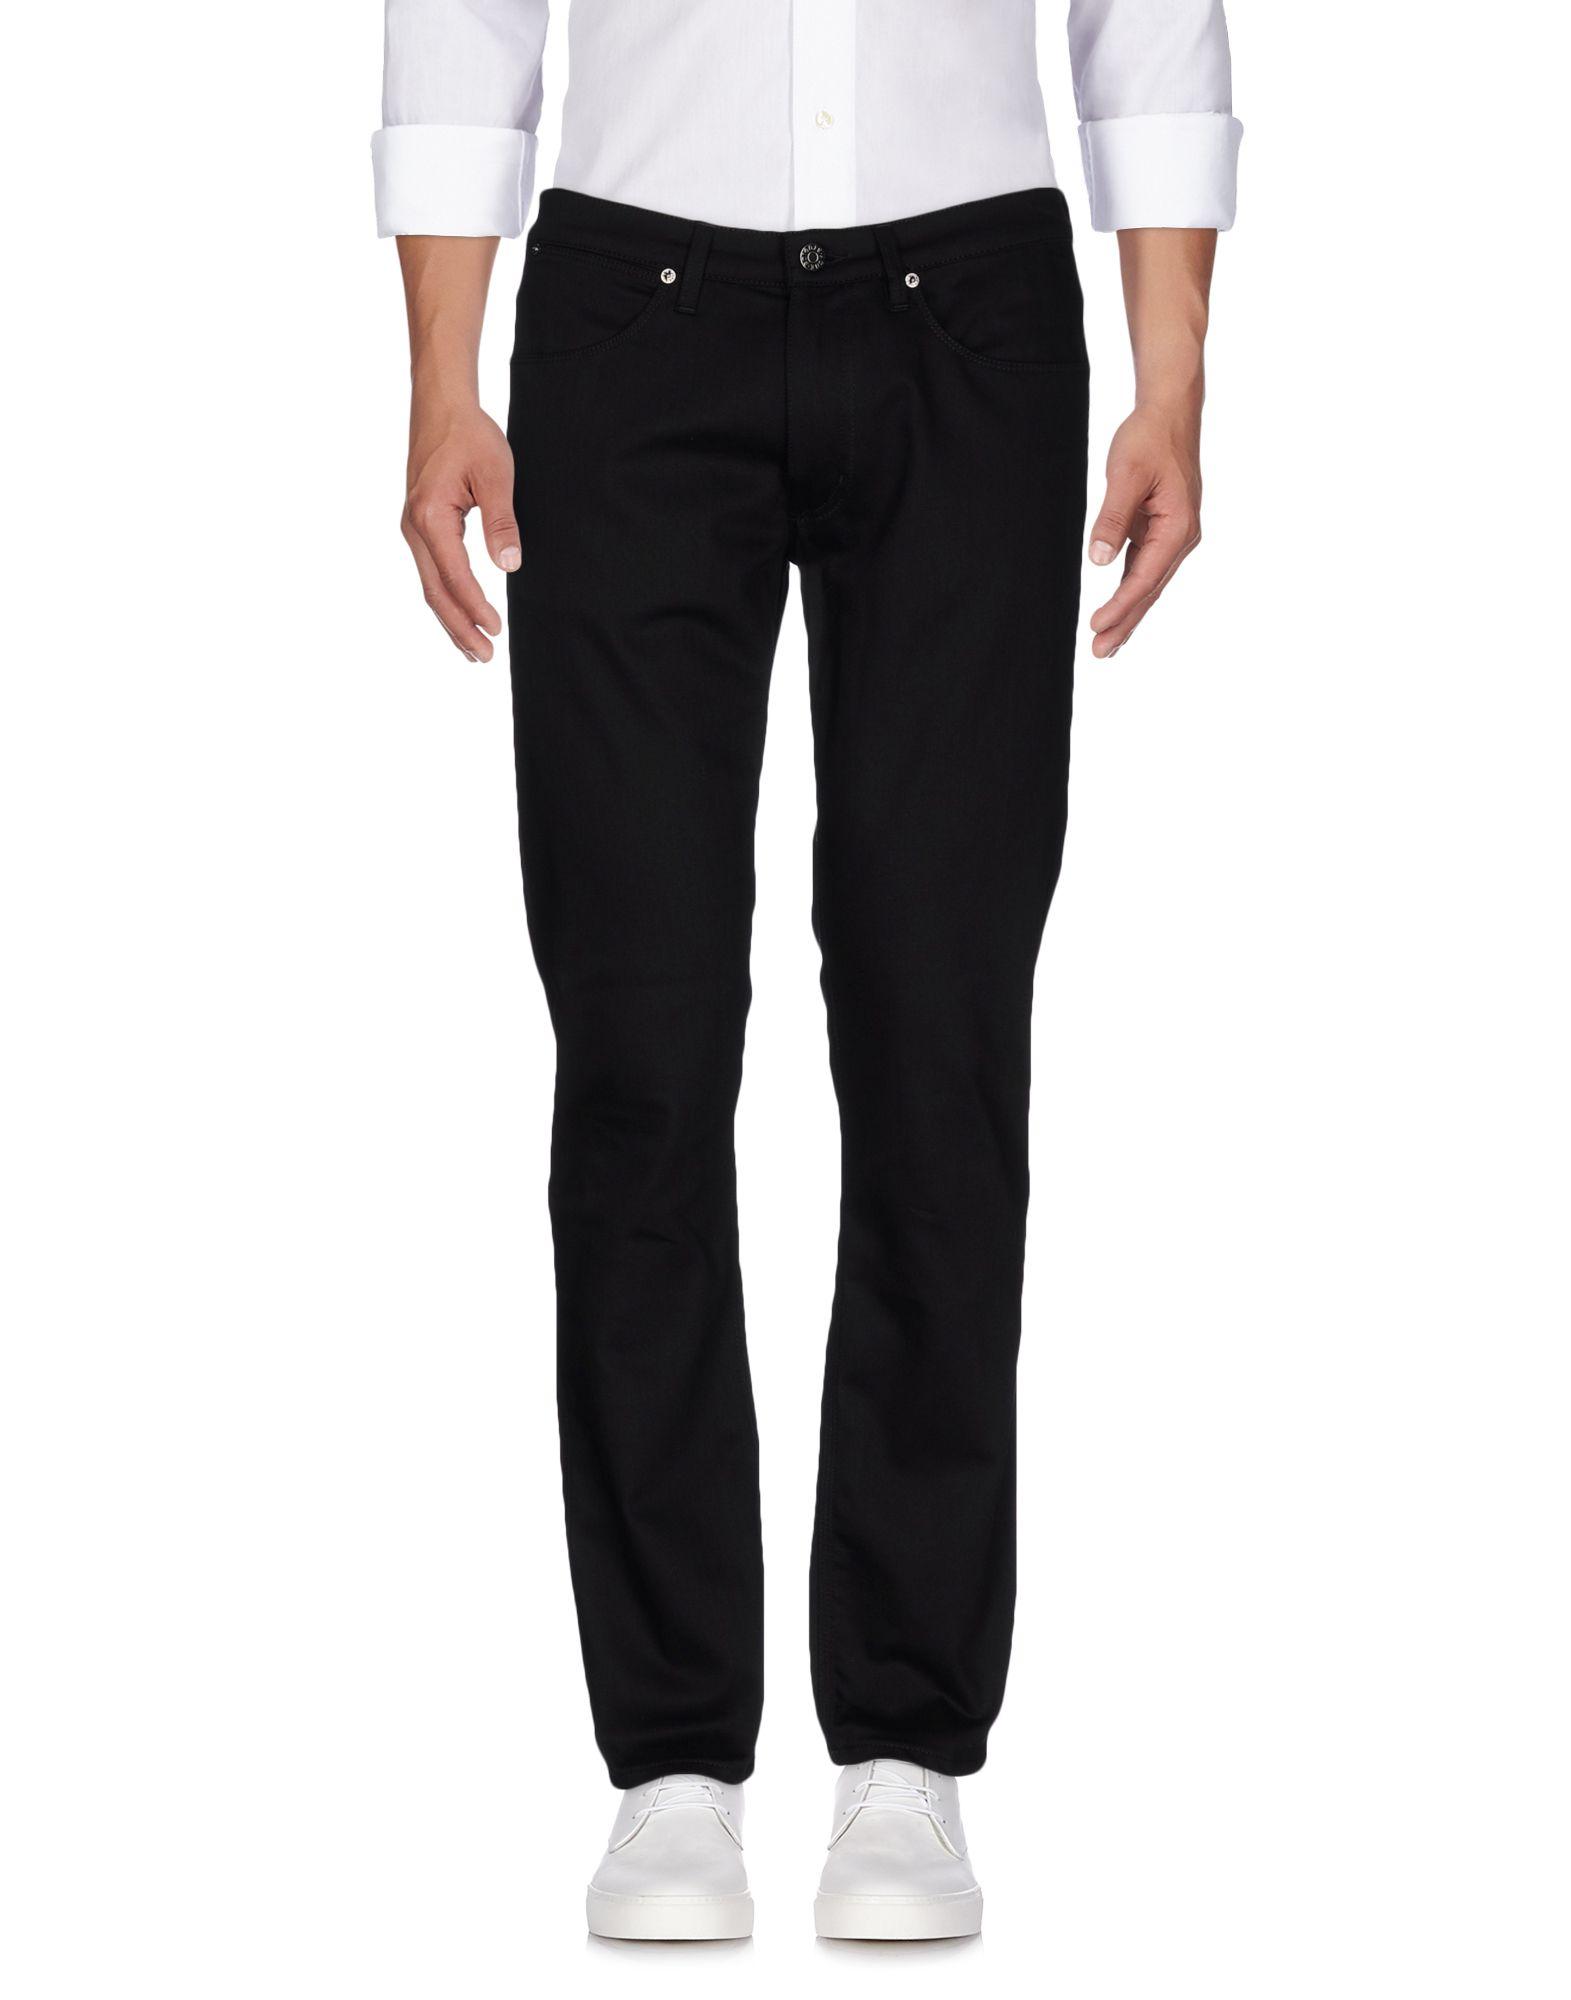 Pantaloni Jeans Acne Studios Donna - Acquista online su